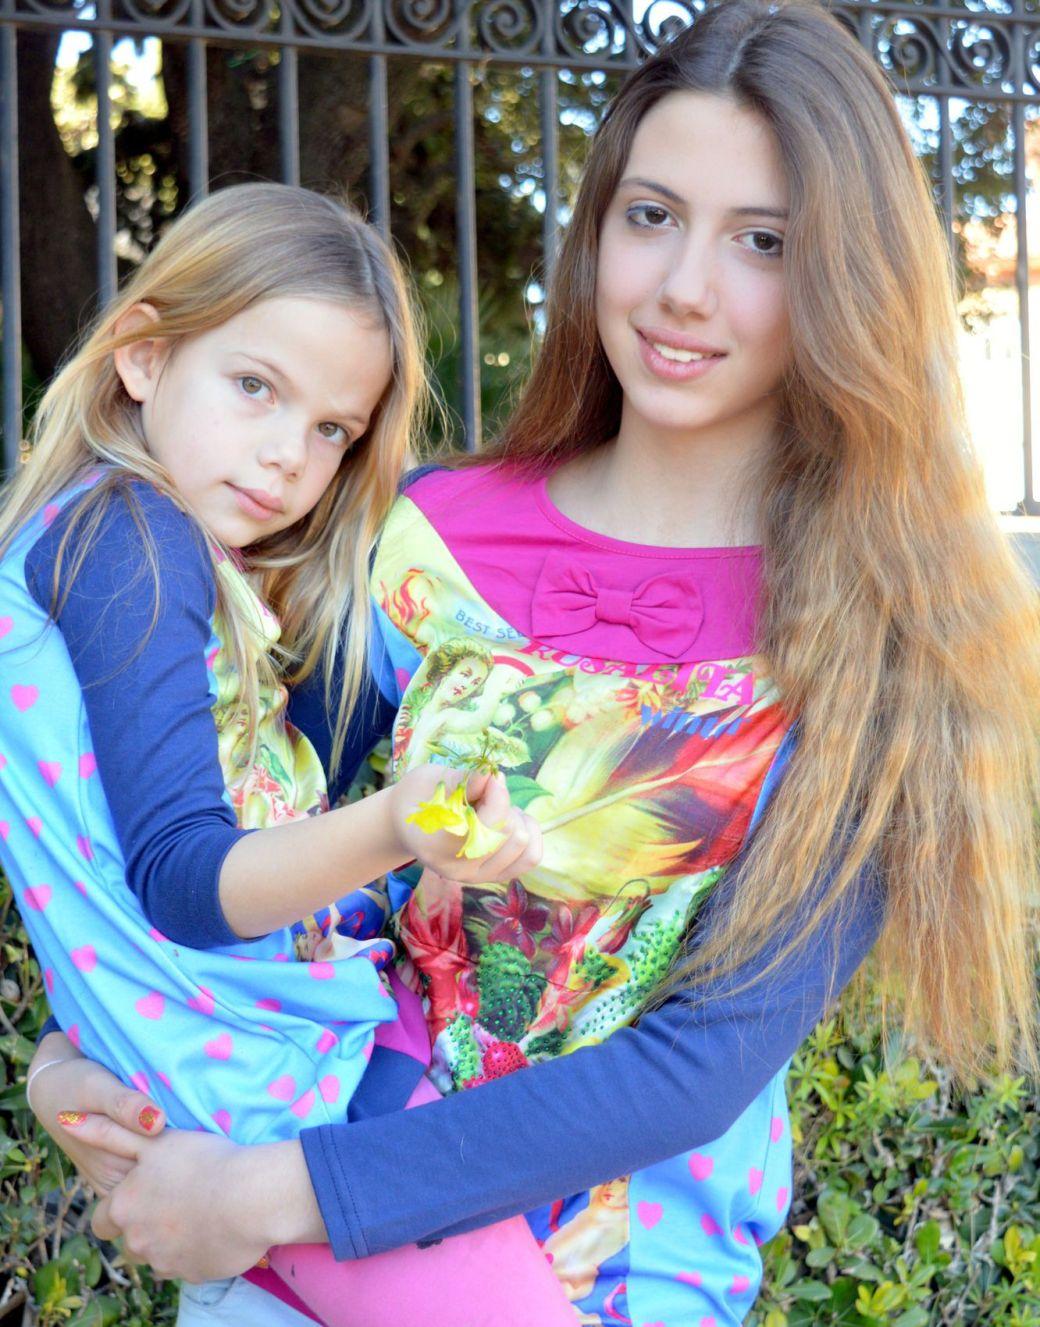 rosalita señoritas moda infantil y juvenil 8